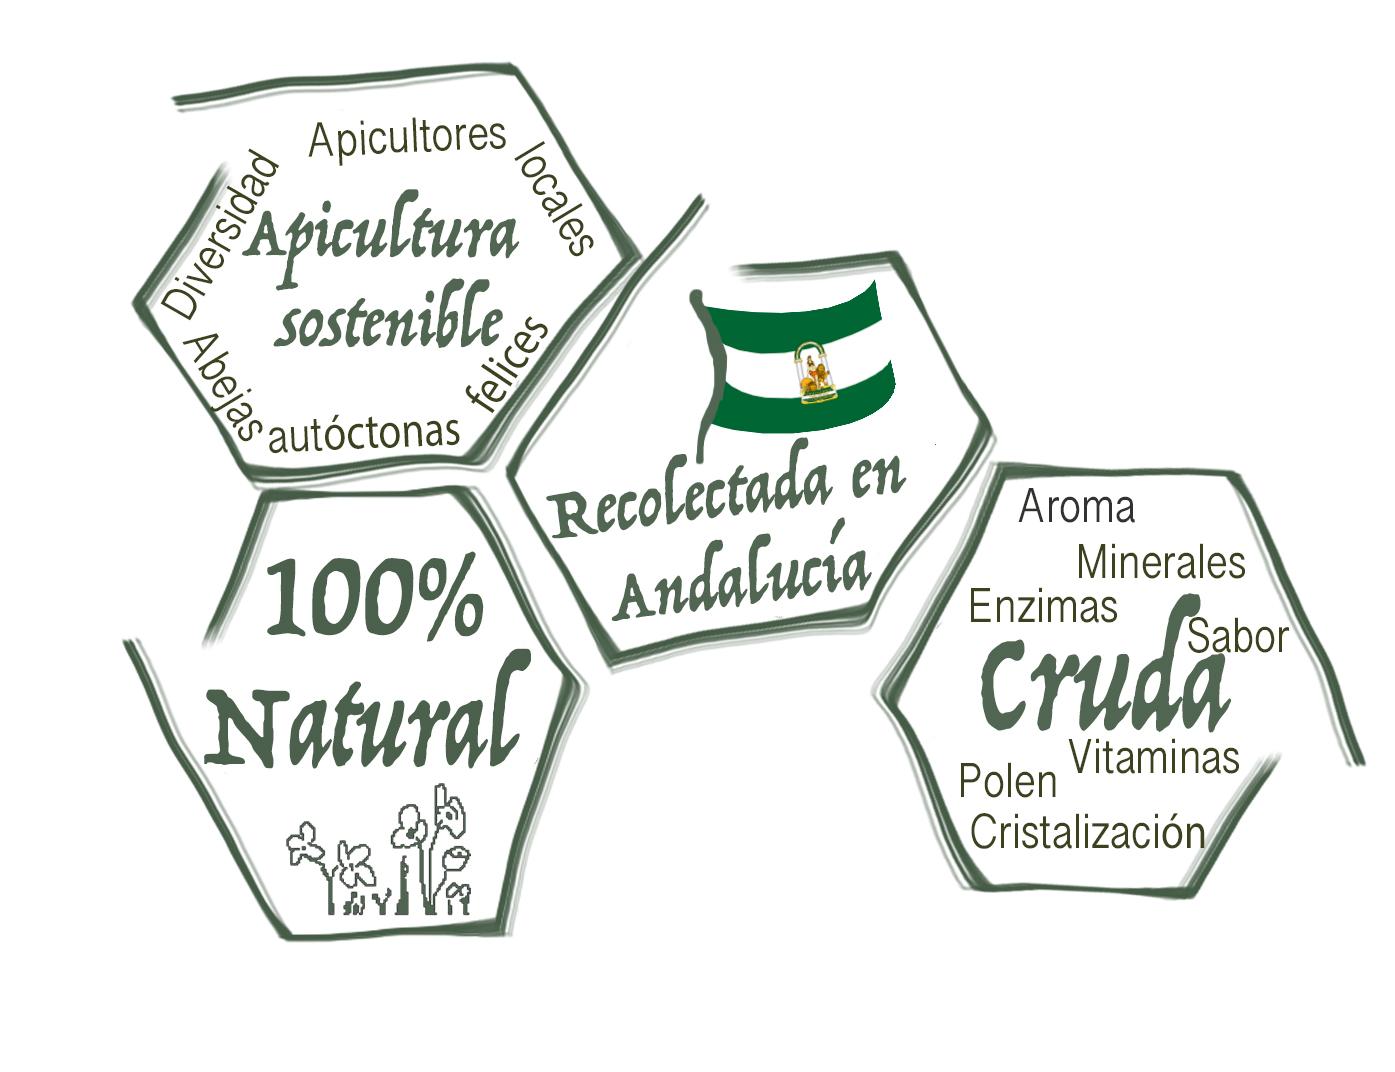 Andalucia local natural LocalMiel